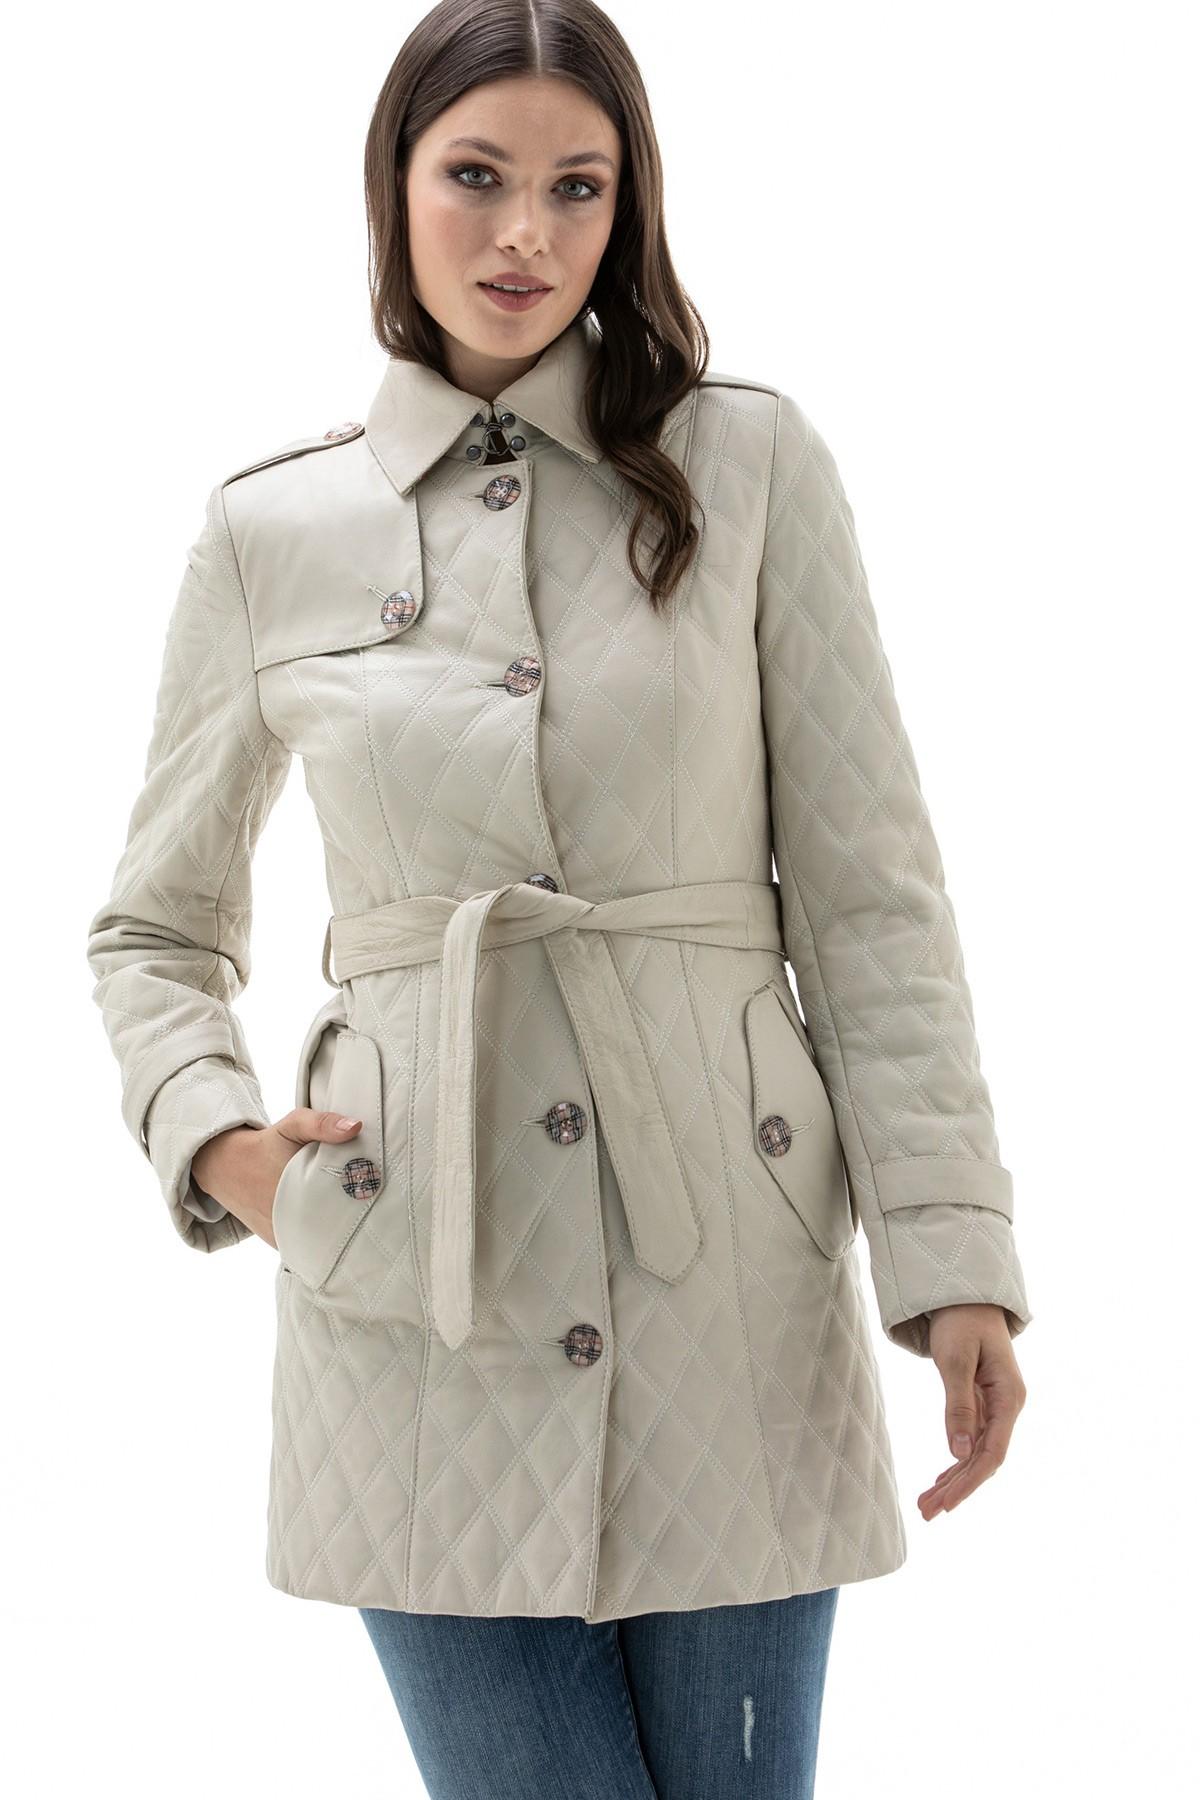 Wilson Leather Coats On Sale